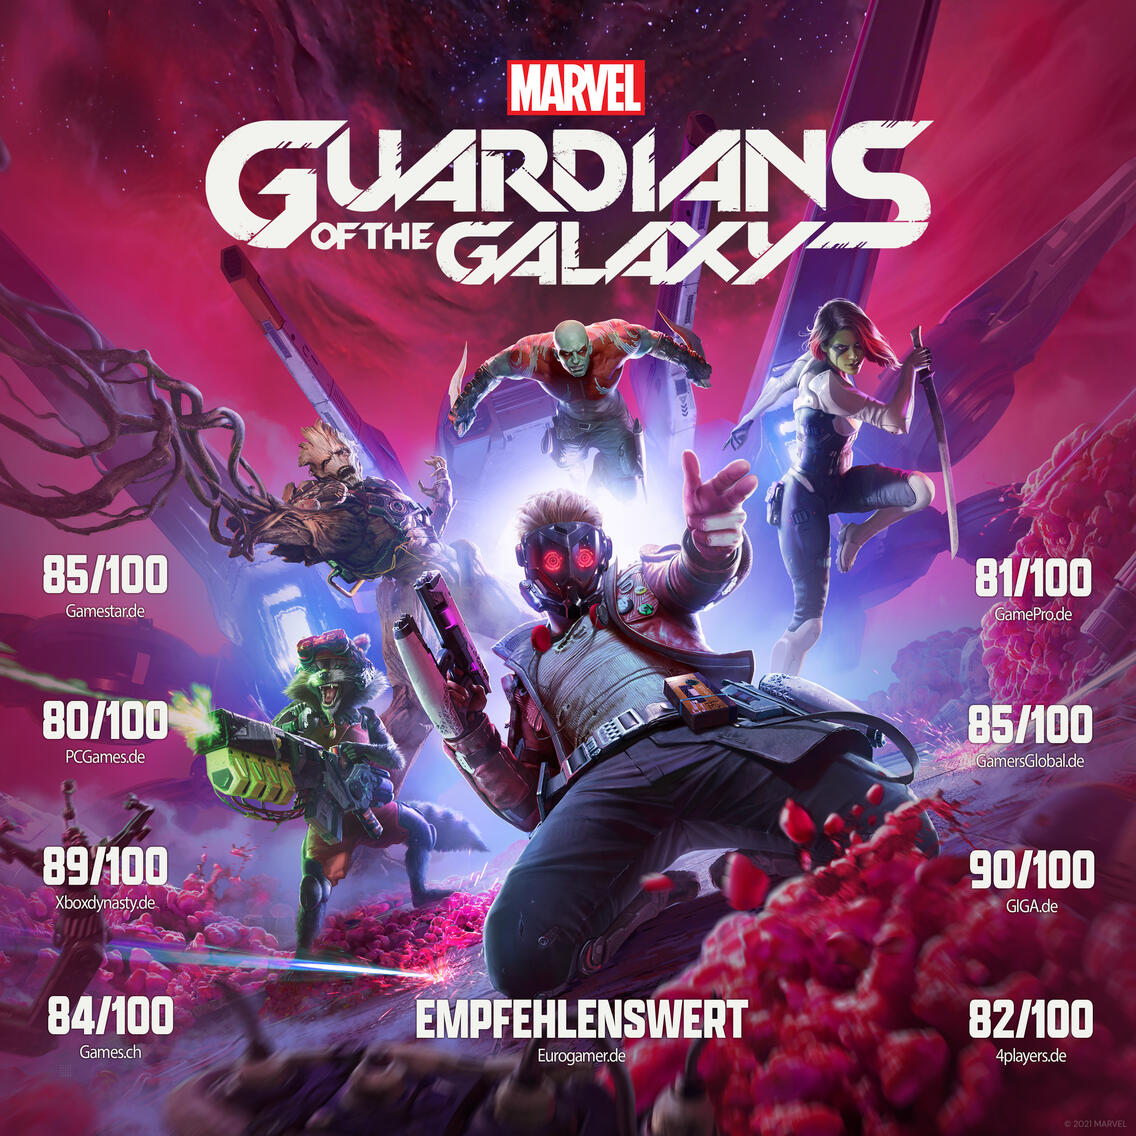 MARVEL Guardians of the Galaxy Screenshot